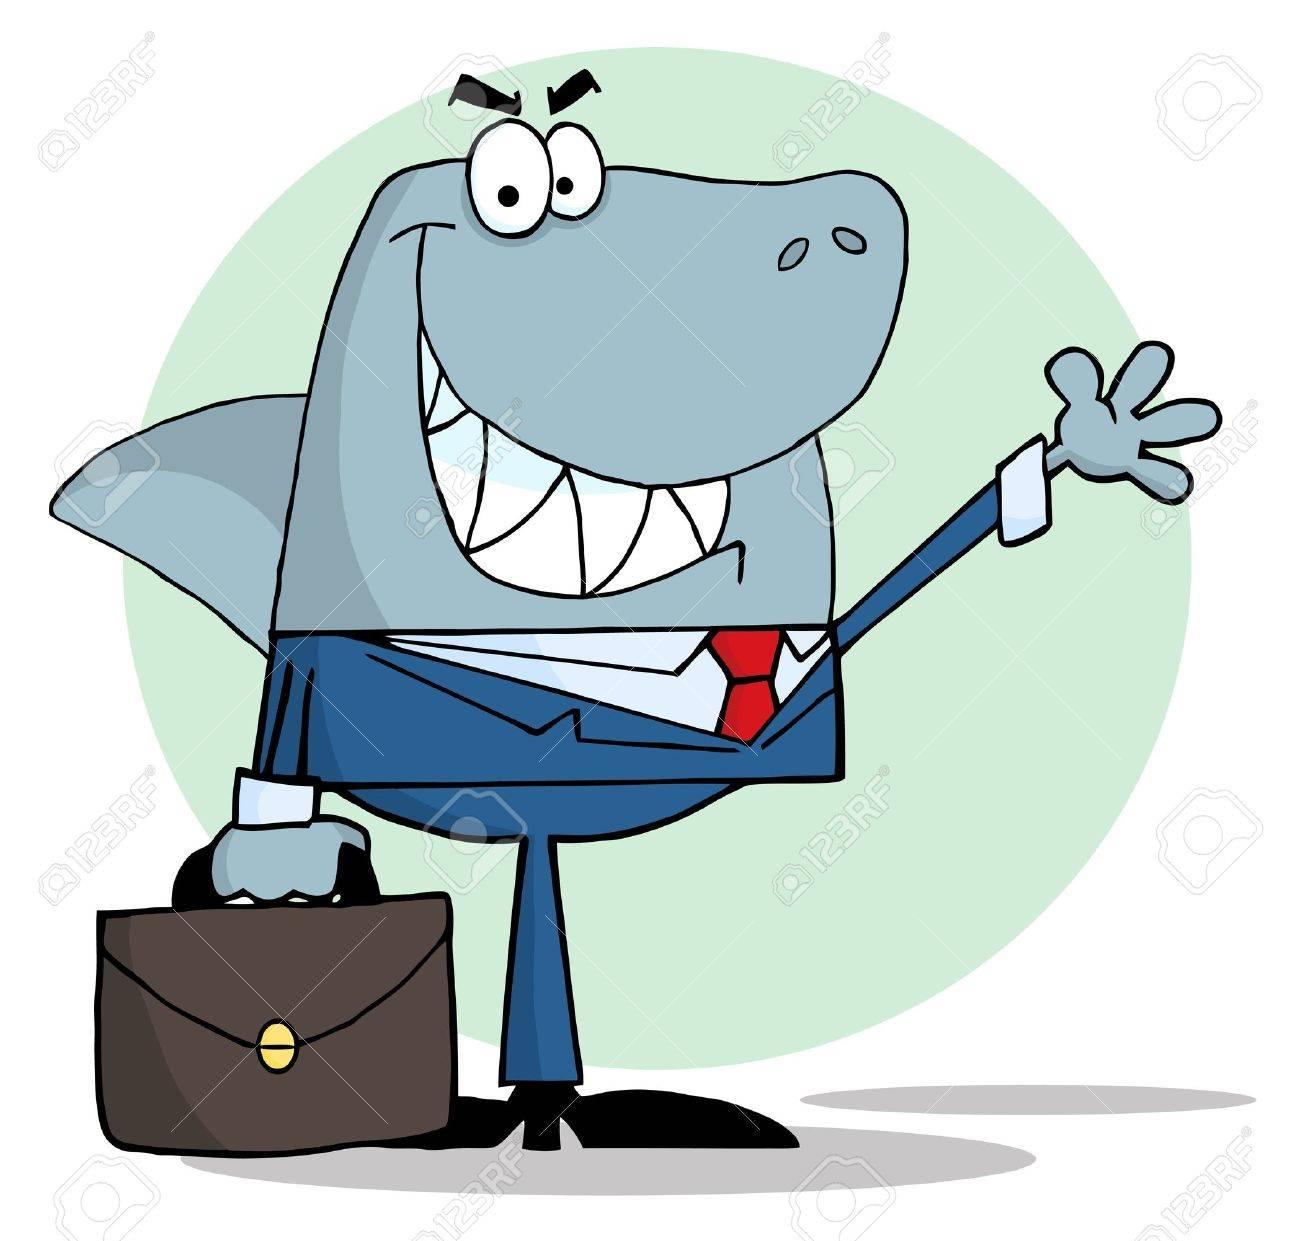 Business team cartoon characters cartoon vector cartoondealer com - Salesman Cartoon Business Shark Waving A Greeting